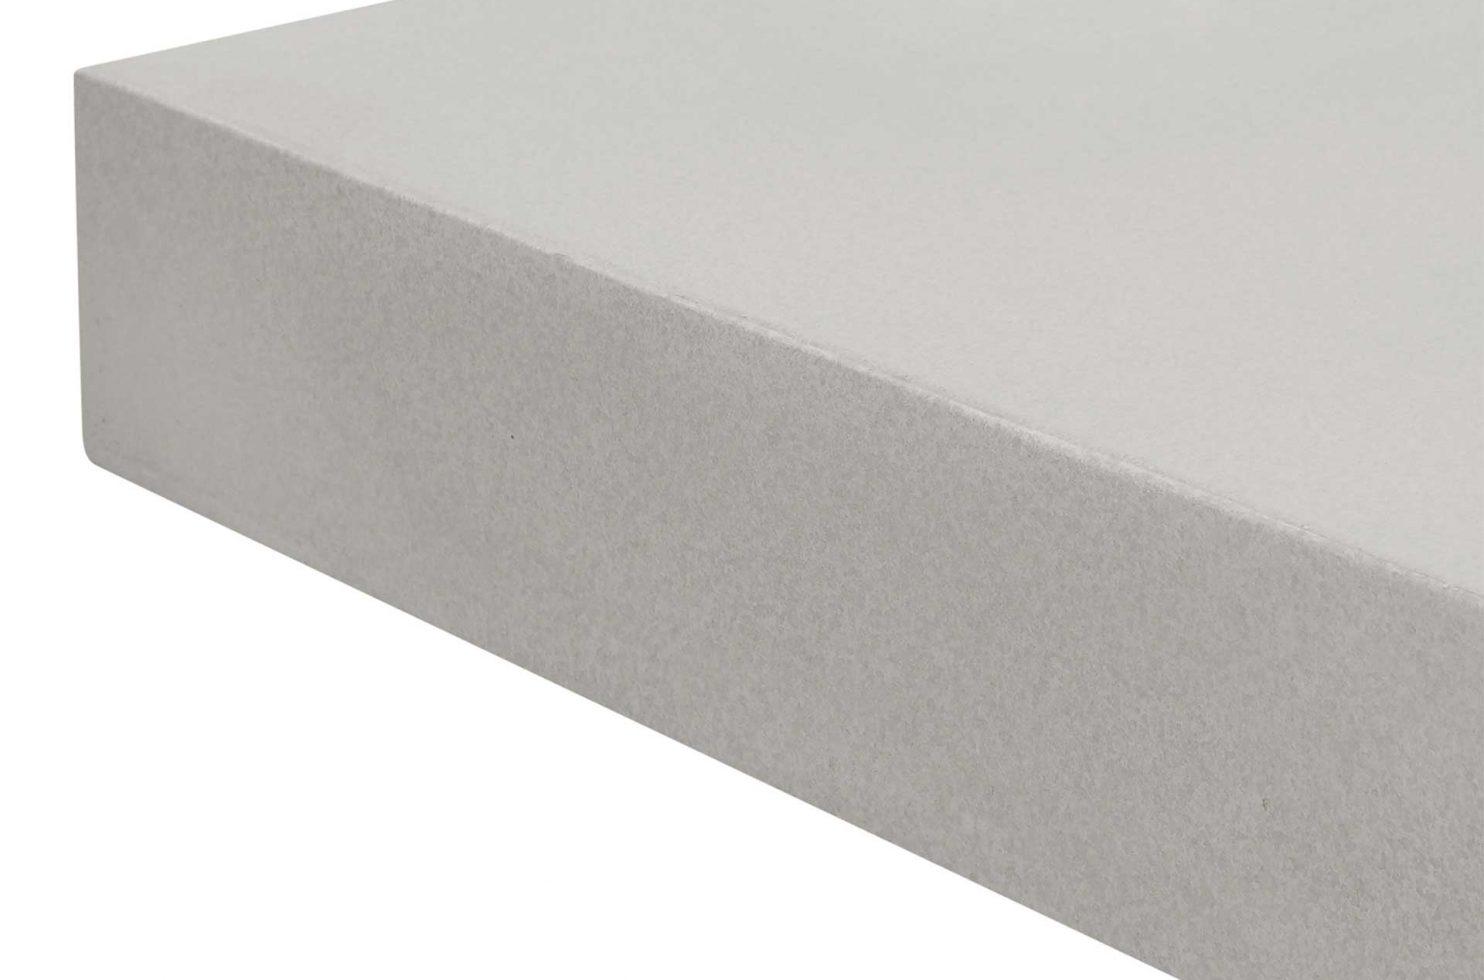 prov frp meditation rectangle bench S1568100215 dtl5 web